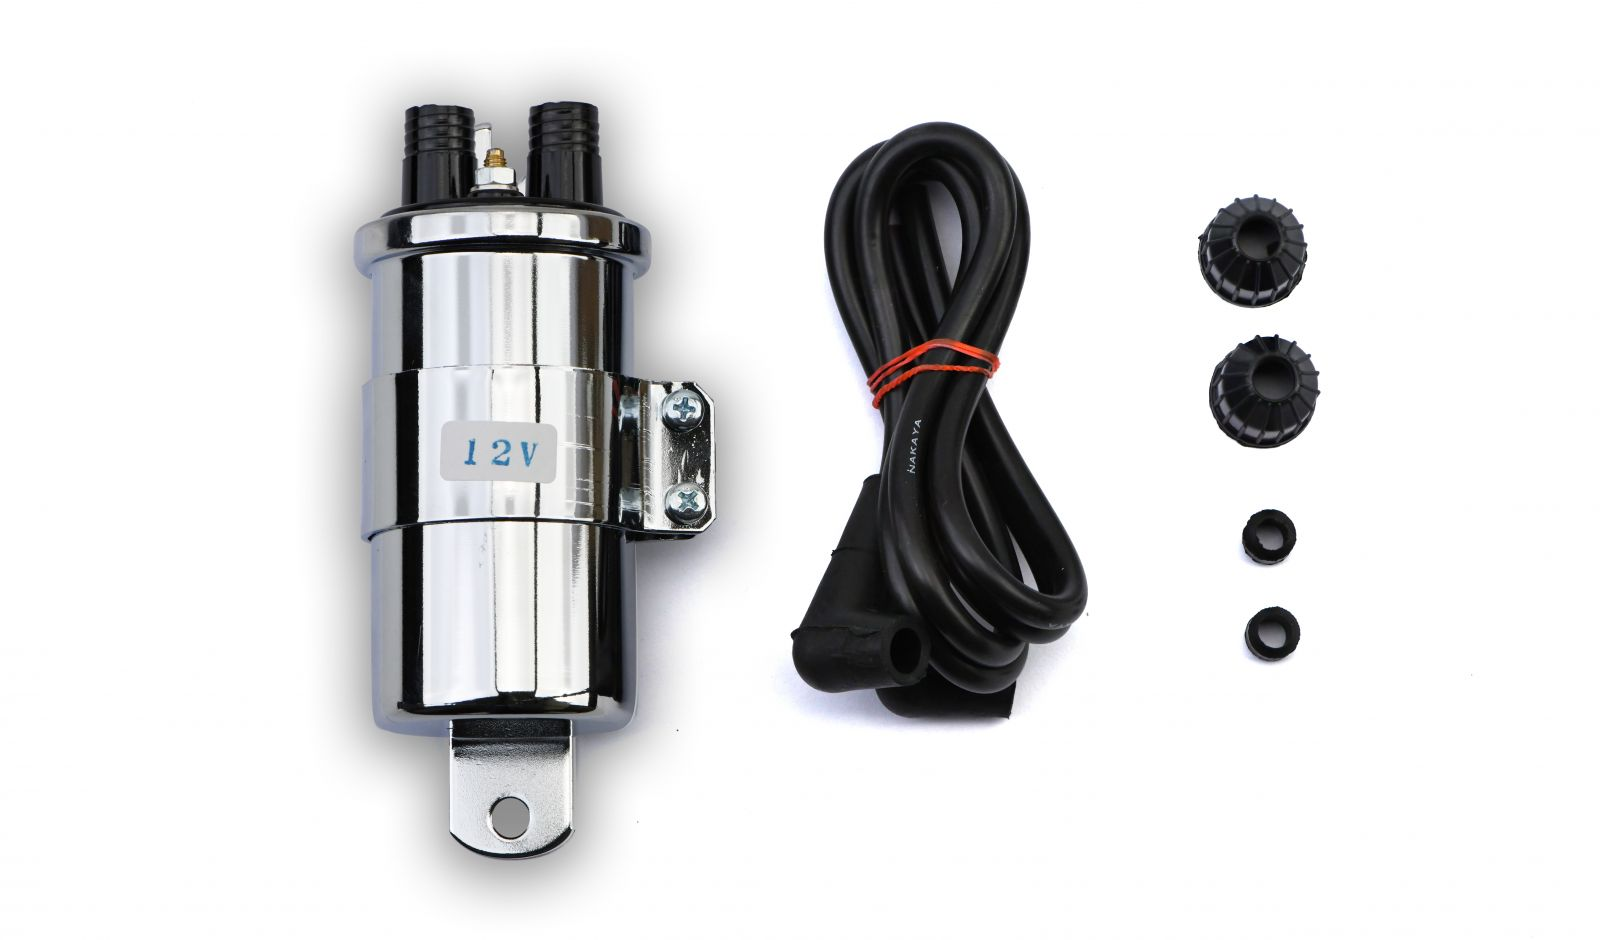 ignition coils - 540312H image